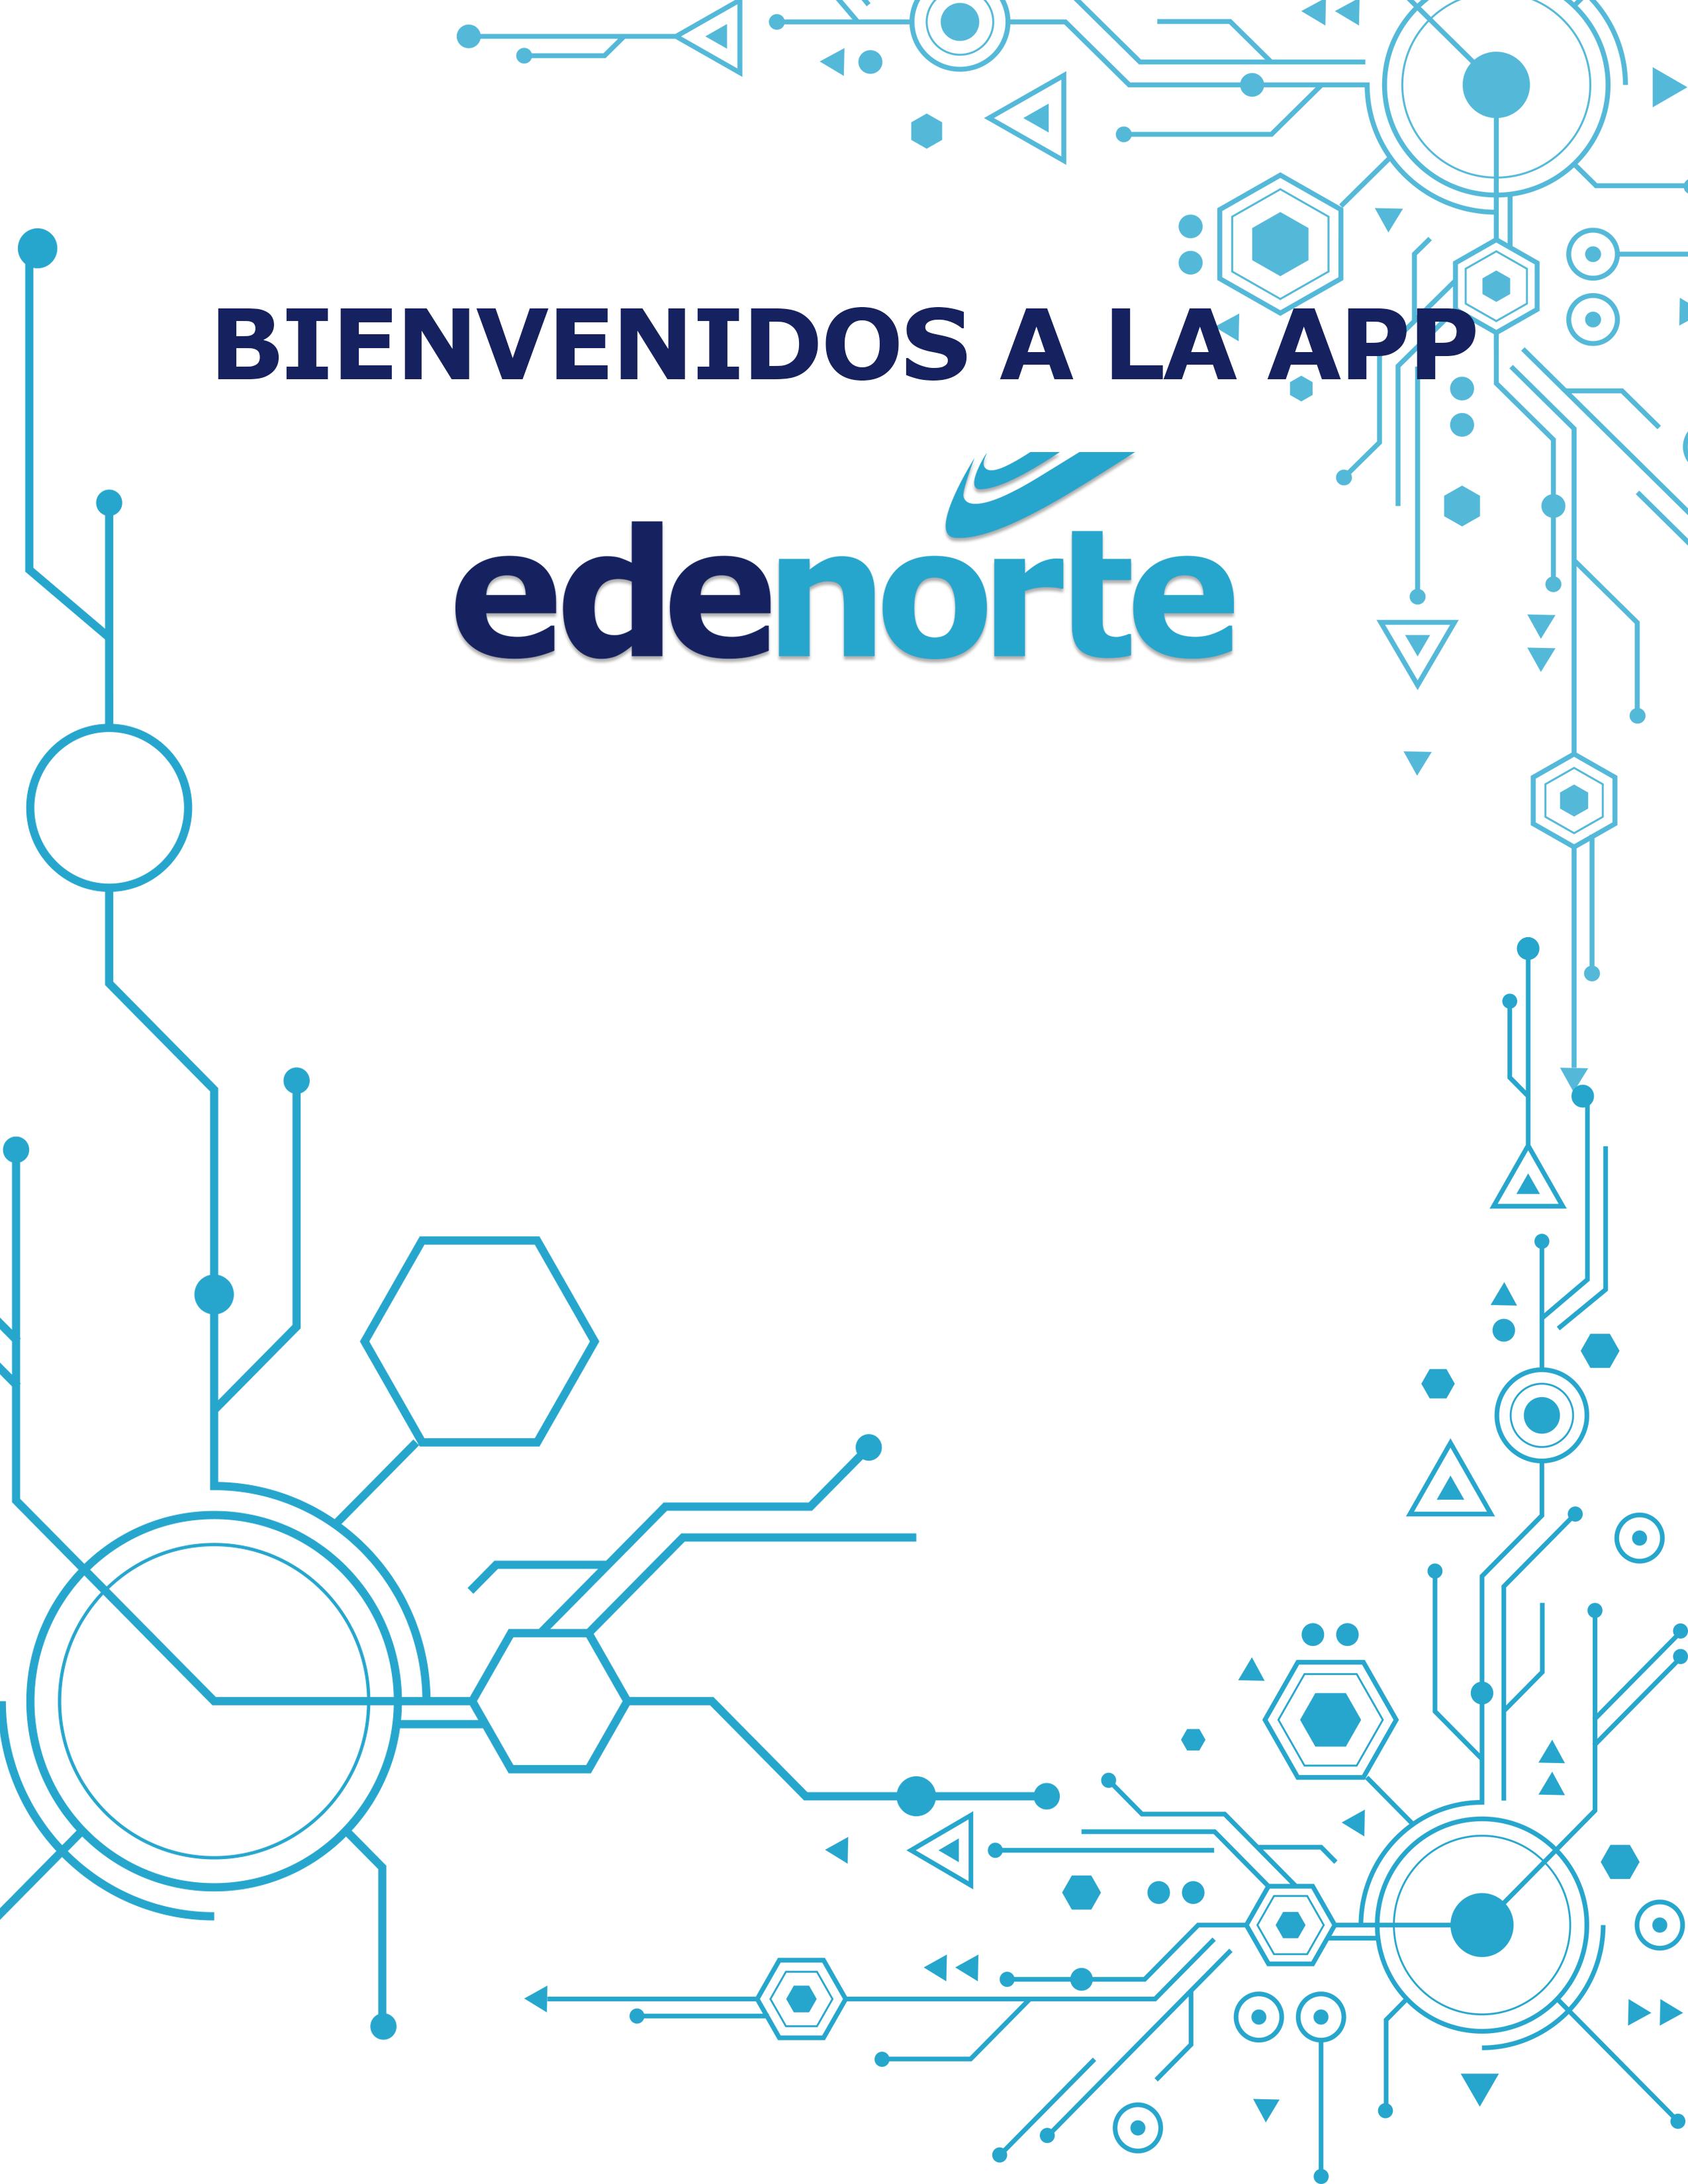 Aplicación móvil Edenorte (App Edenorte